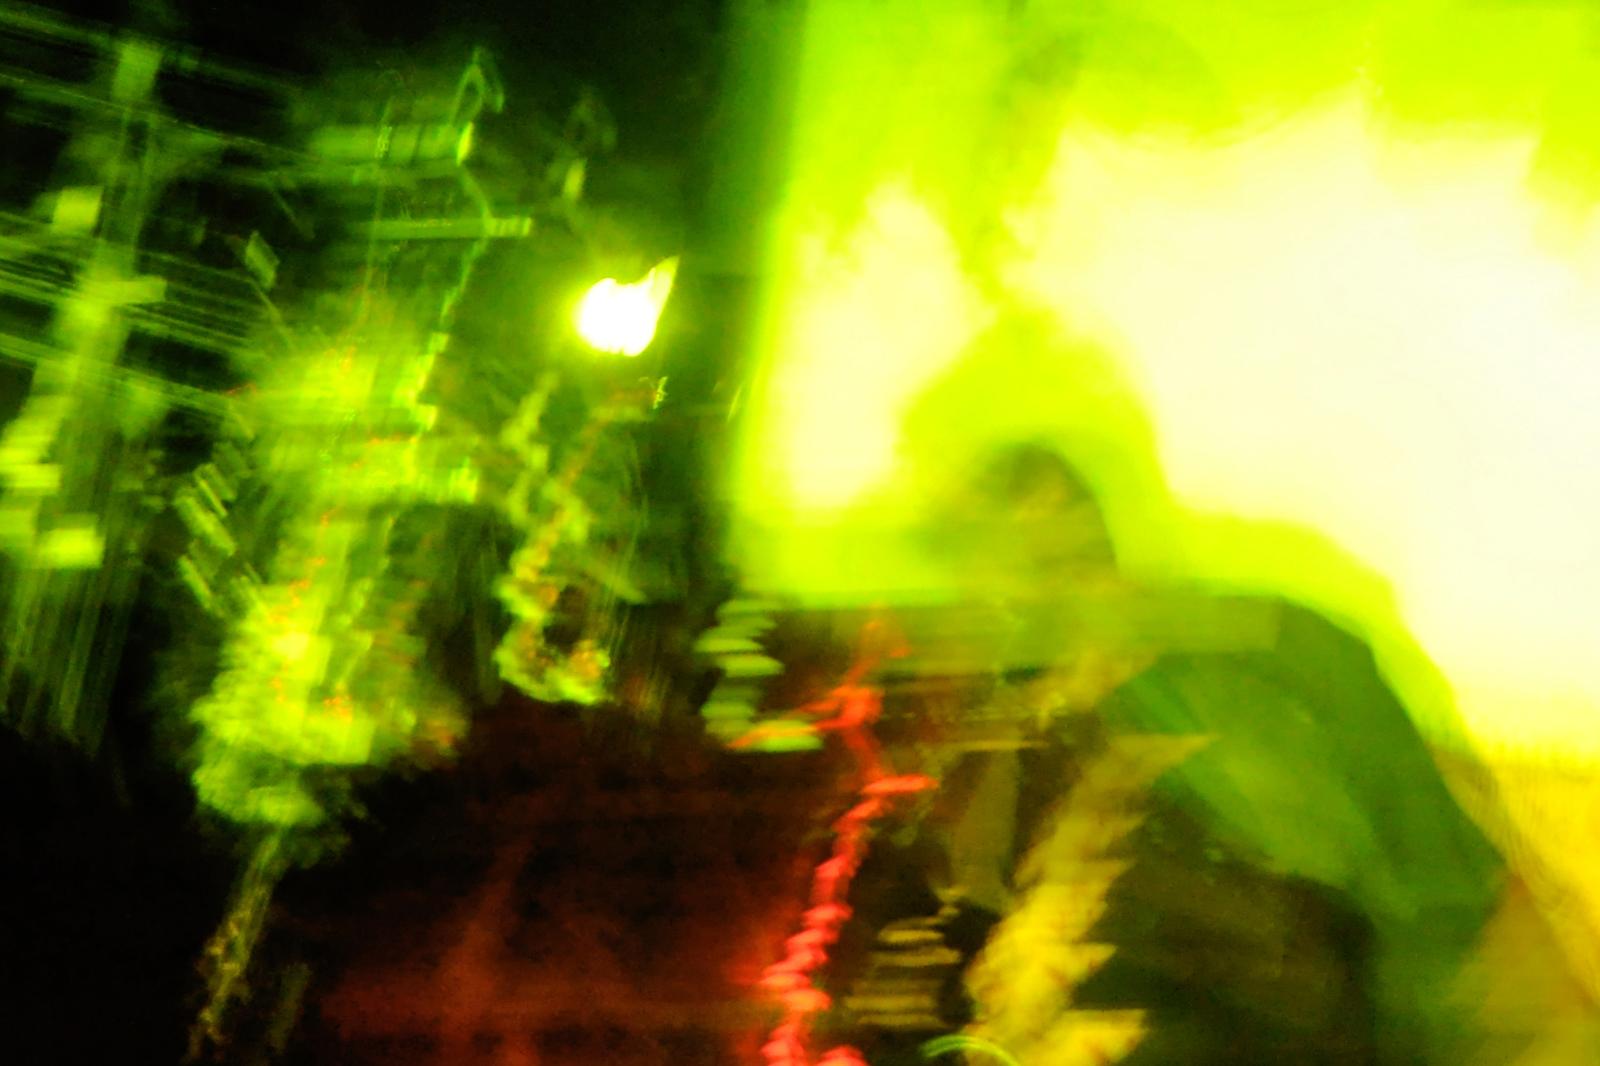 Fuego concierto Sun Araw + Laraaji Apolo sala Apolo Barcelona